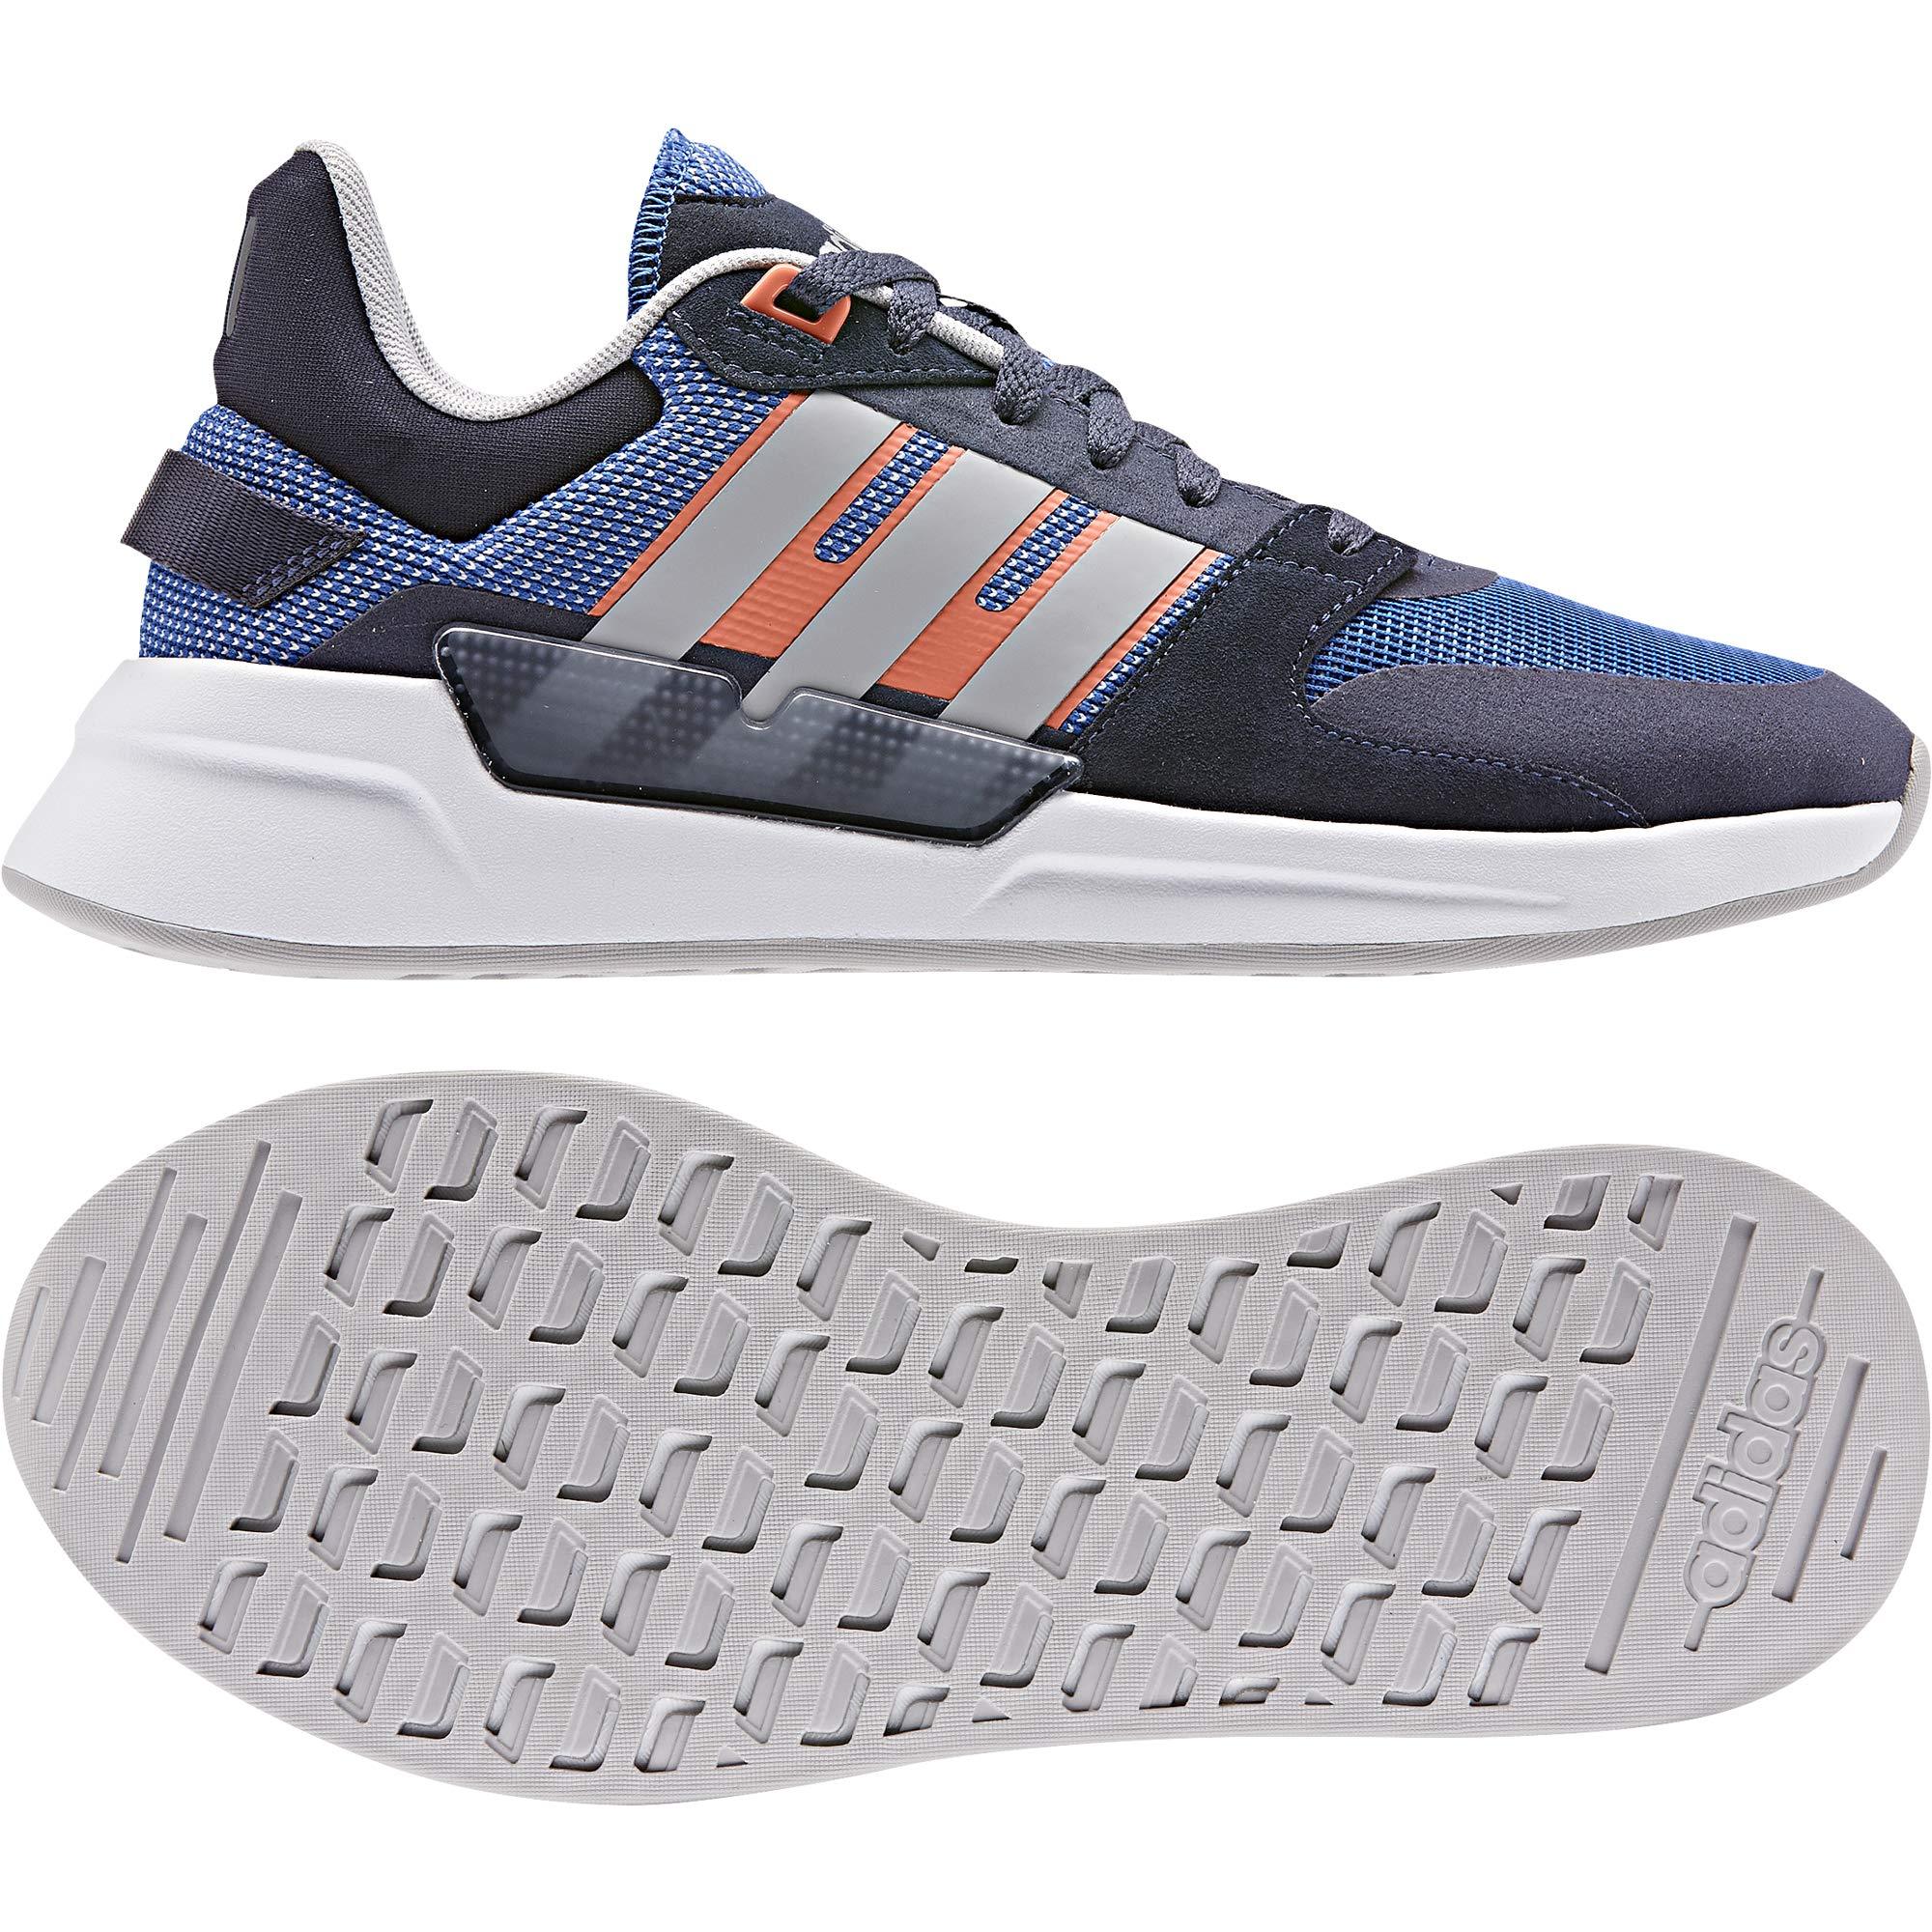 gridos Eu De 00040 Running FemmeMulticoloreazul Adidas semcor Run90sChaussures Yfg7v6yb